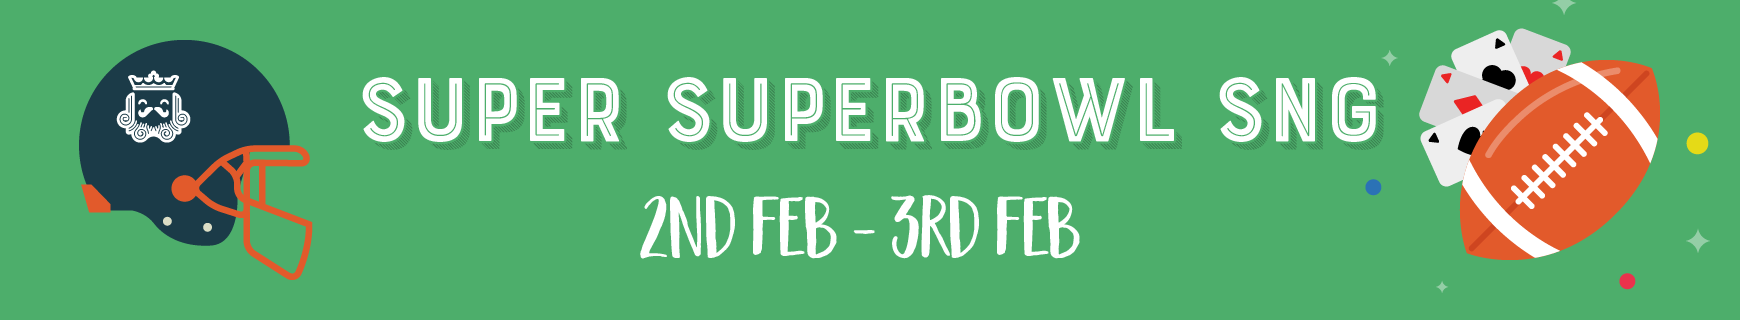 Super superbowl sng %28870 x 160%29 2x